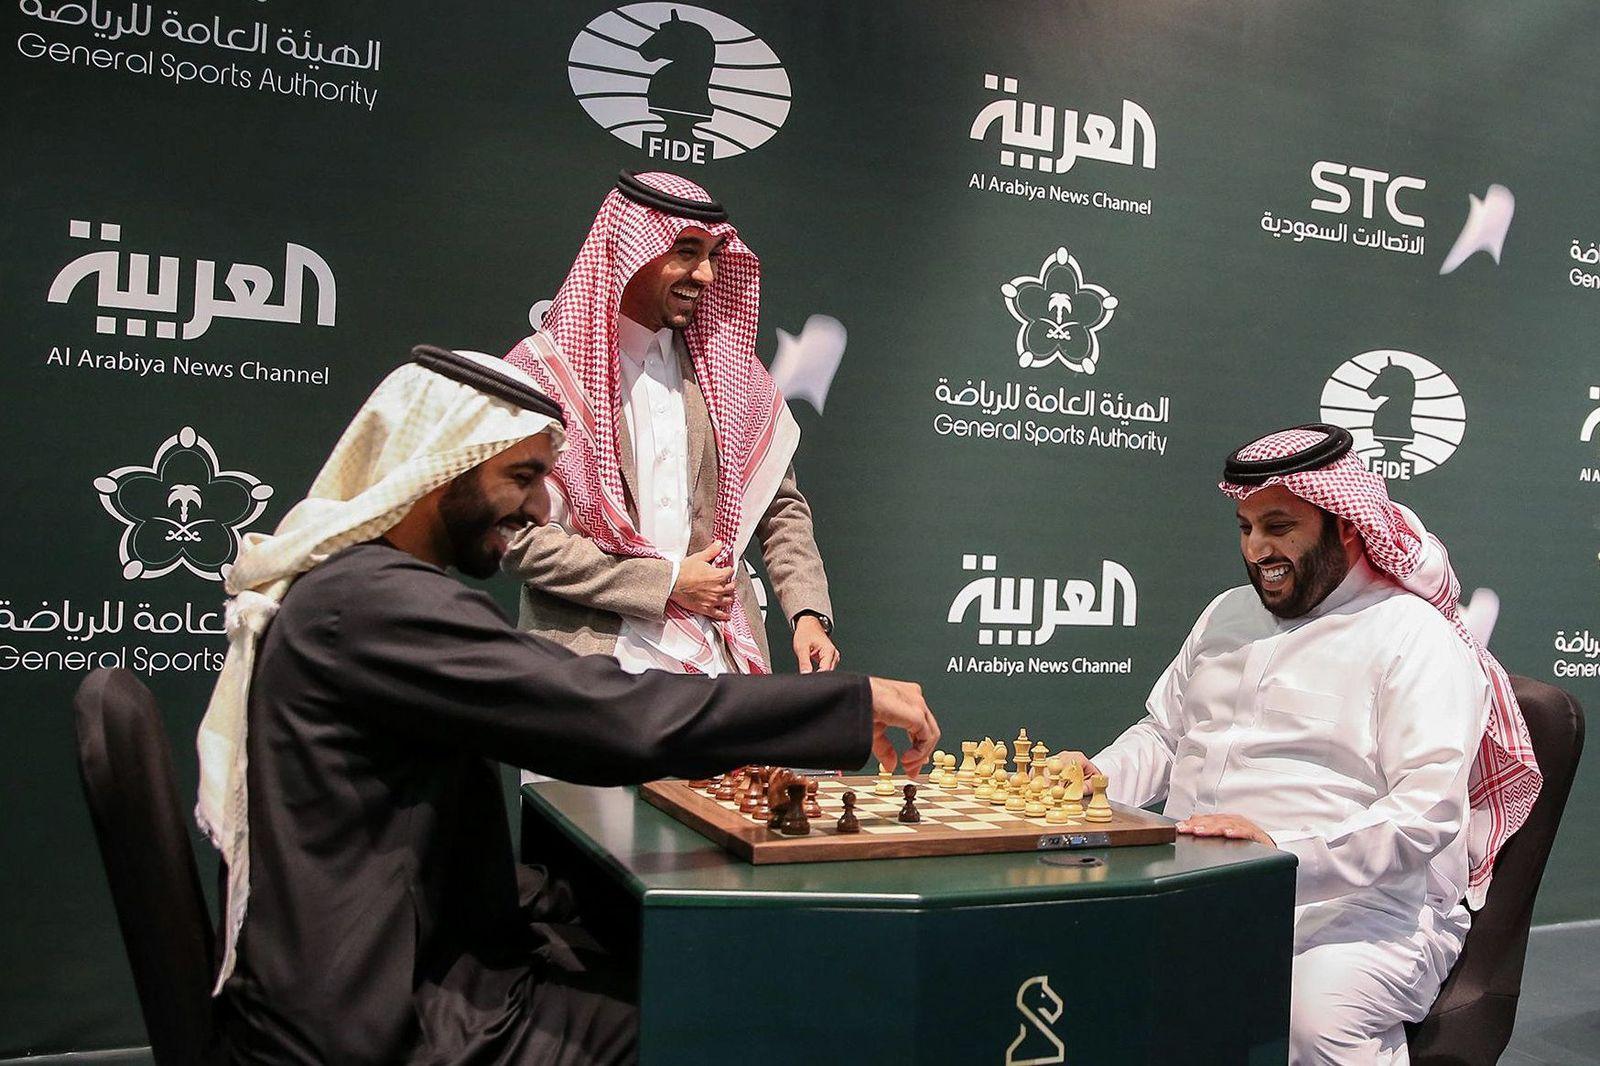 King Salman Chess World Cup Championship